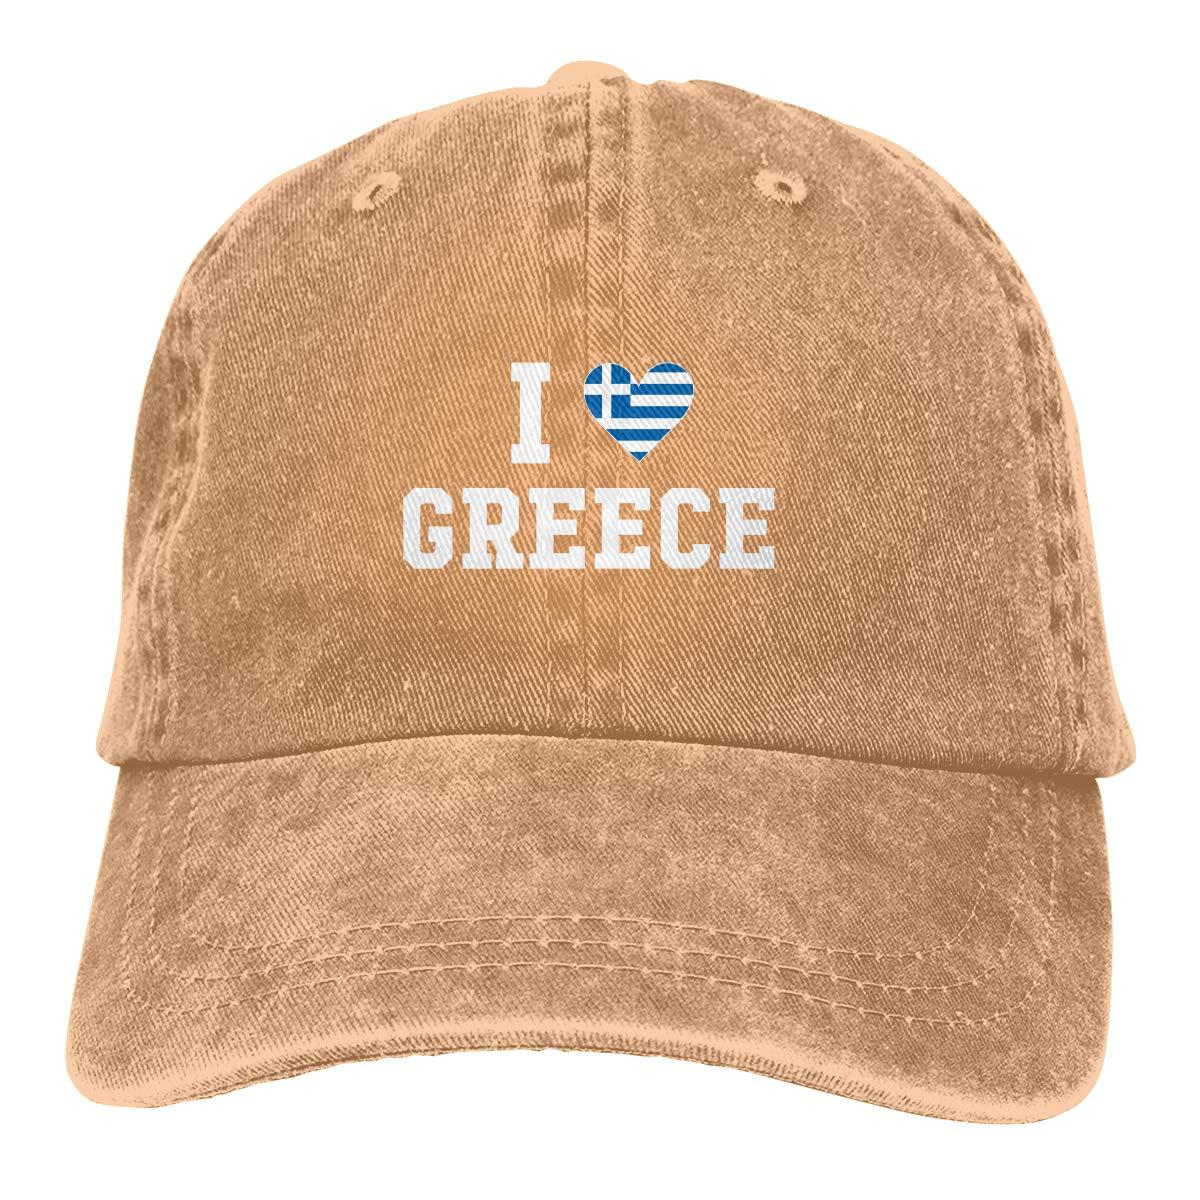 I Love Greece Flag Heart Fashion Adjustable Cowboy Cap Baseball Cap for Women and Men